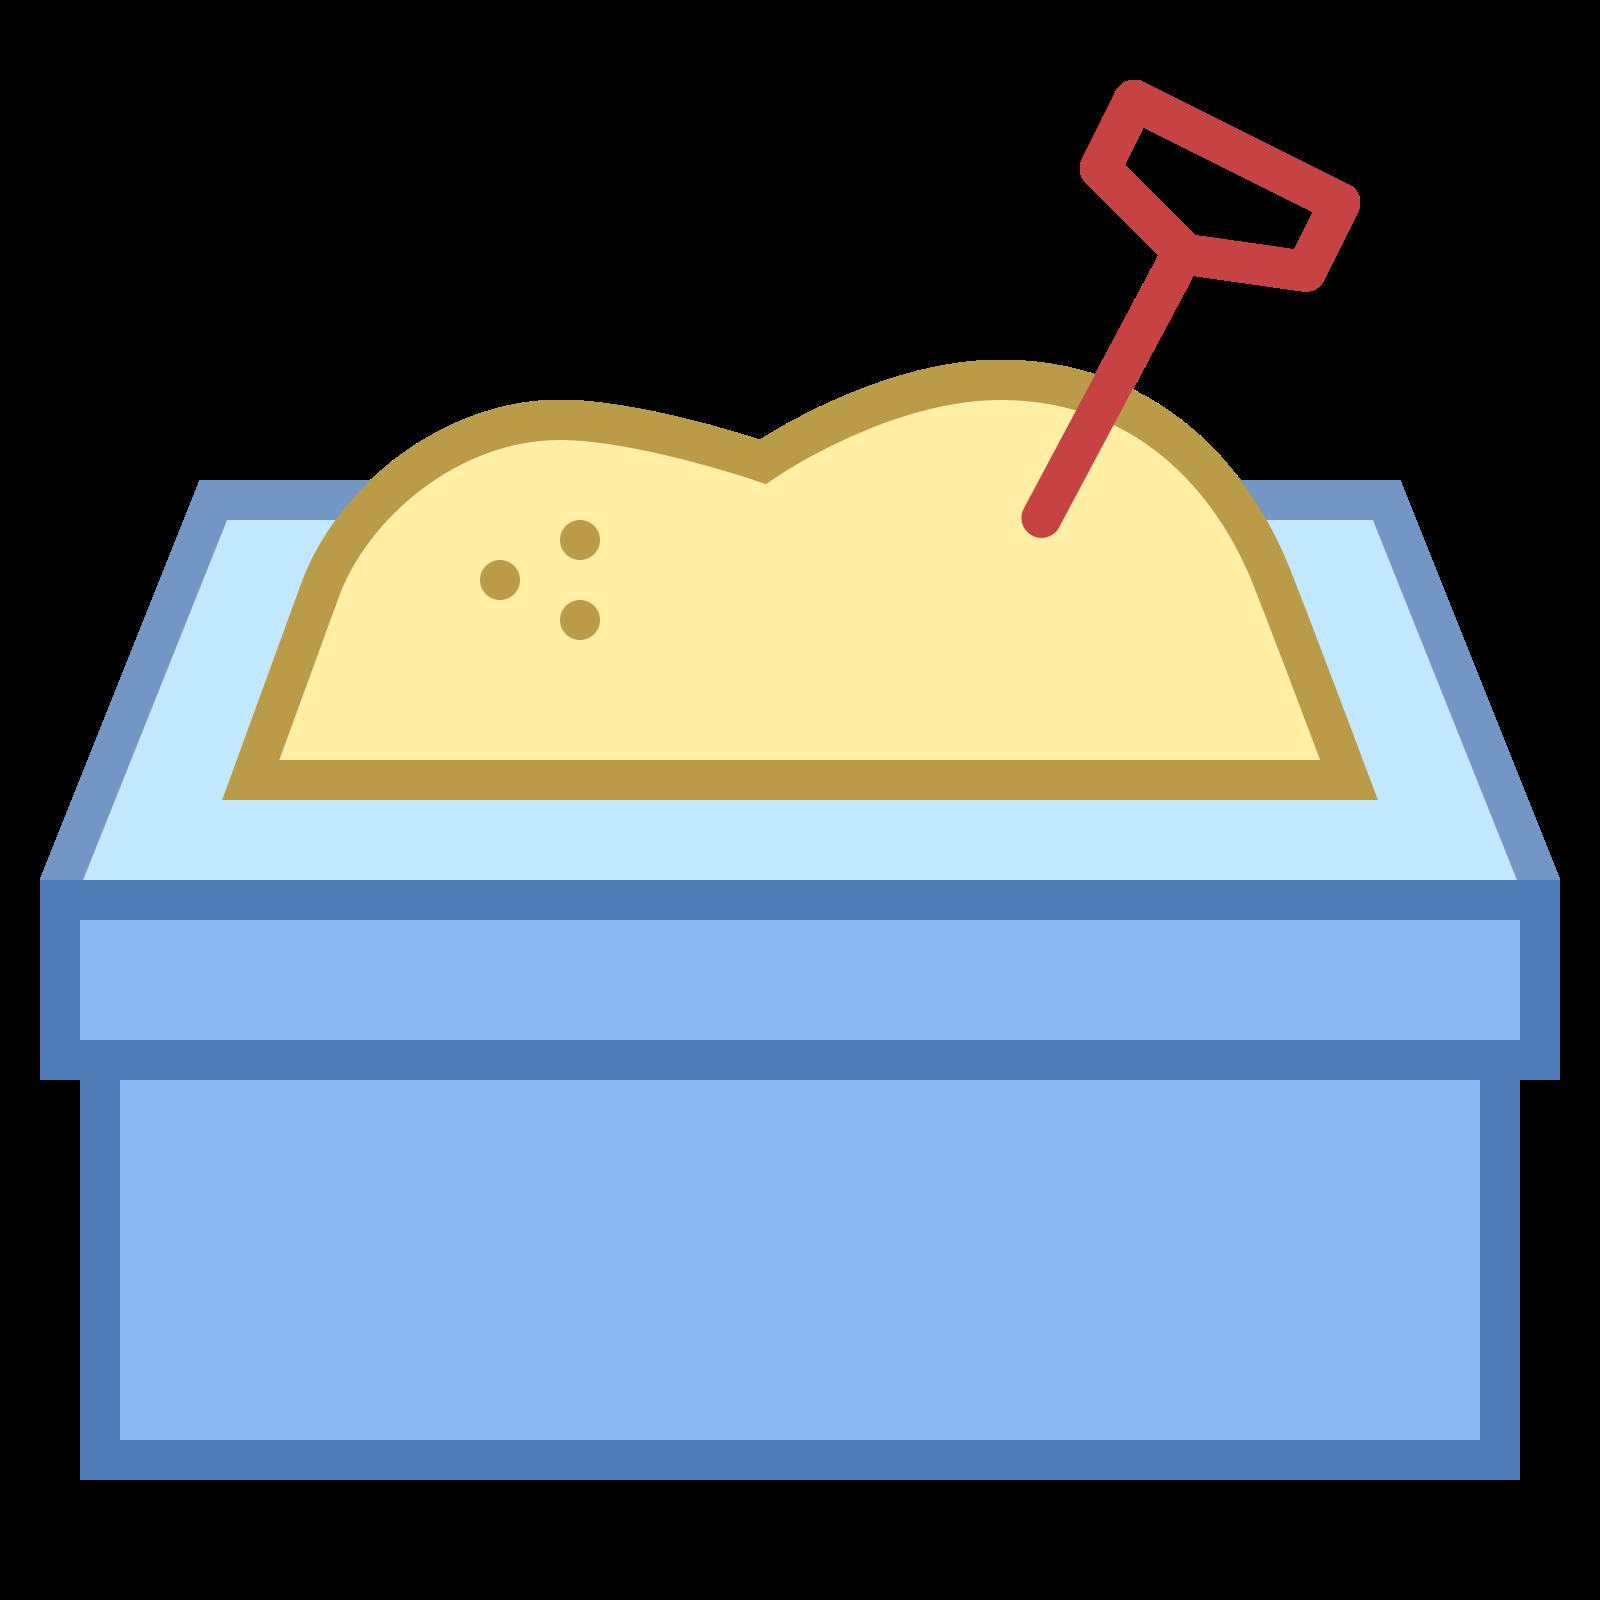 Piaskownica2 icon